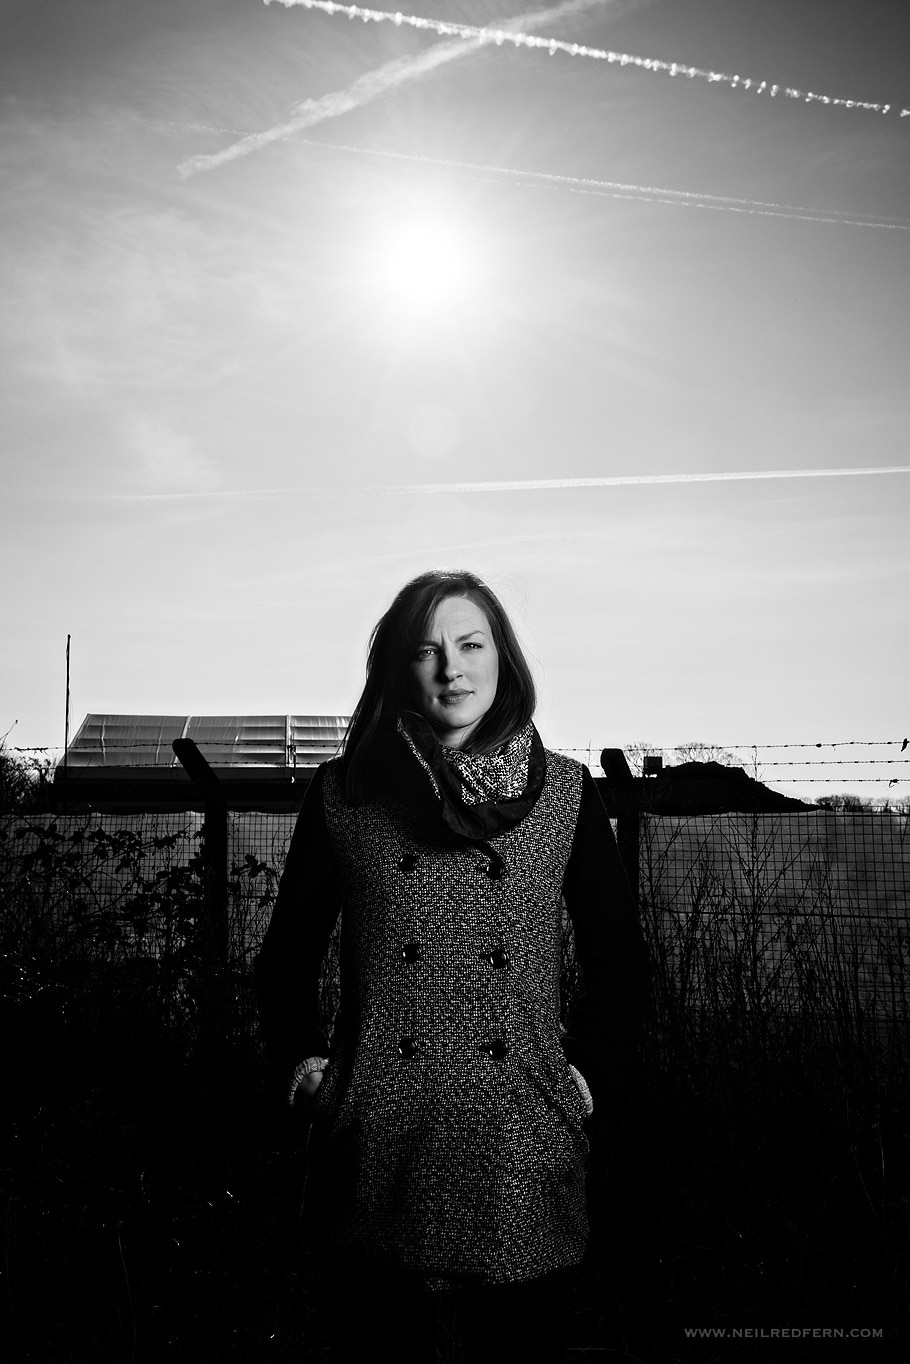 Portrait shoot with Elinchrom Quadra 07